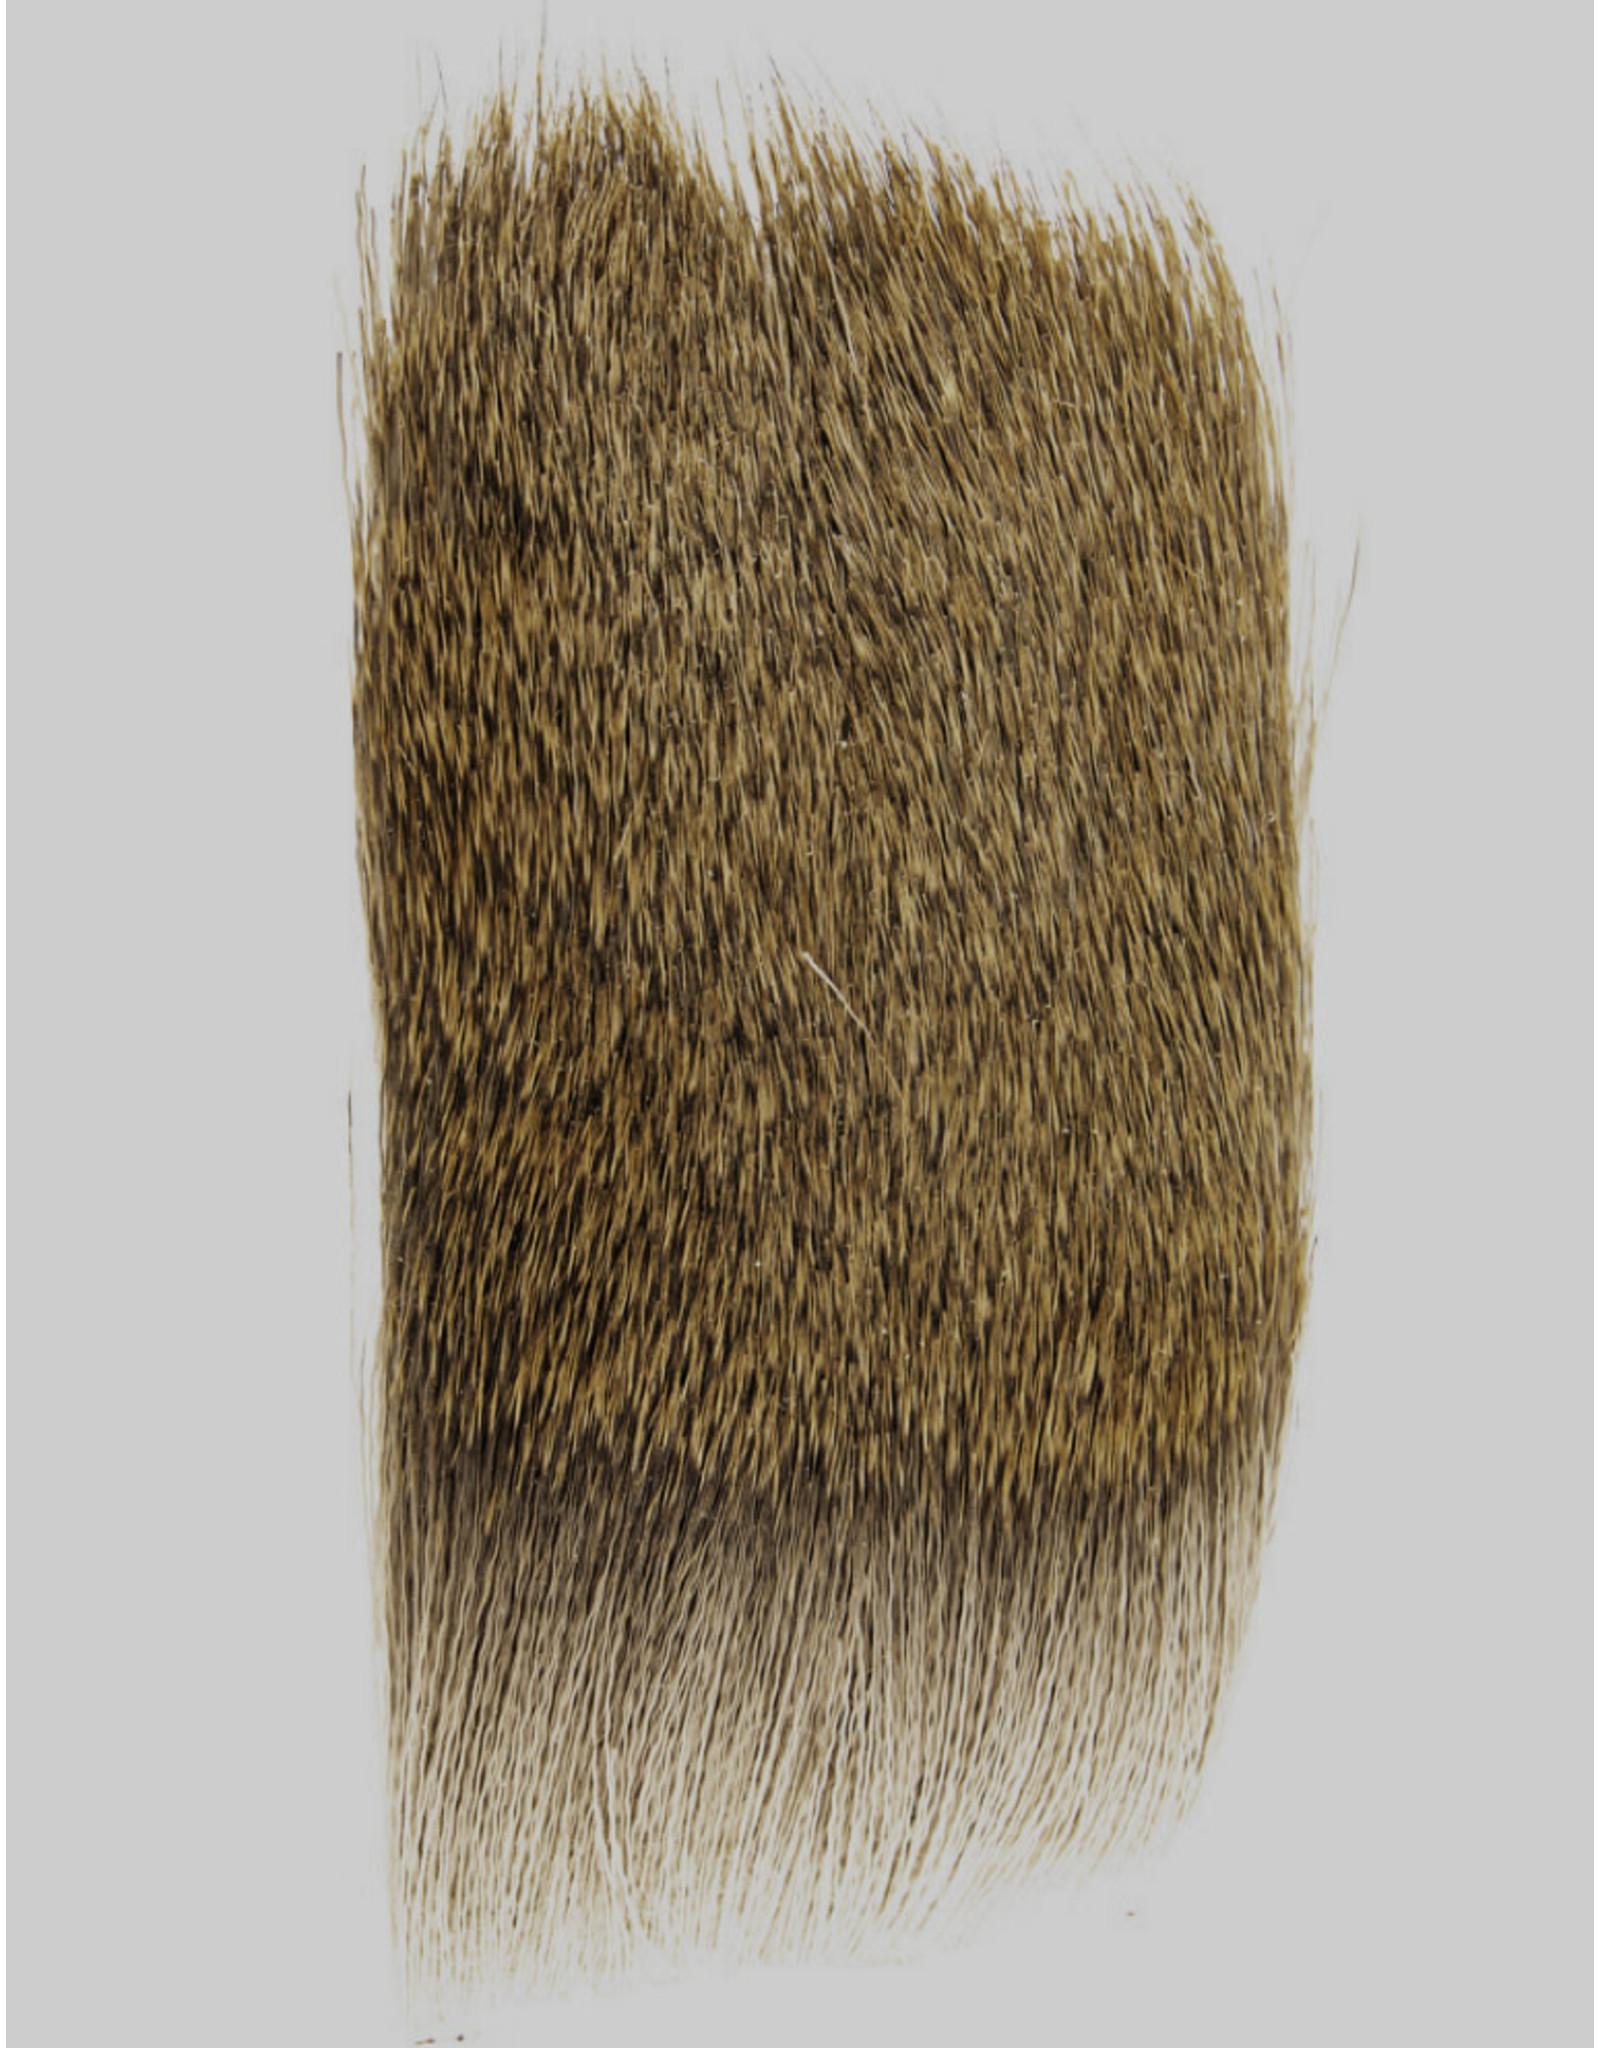 SHOR SHOR Deer Body Hair Natural